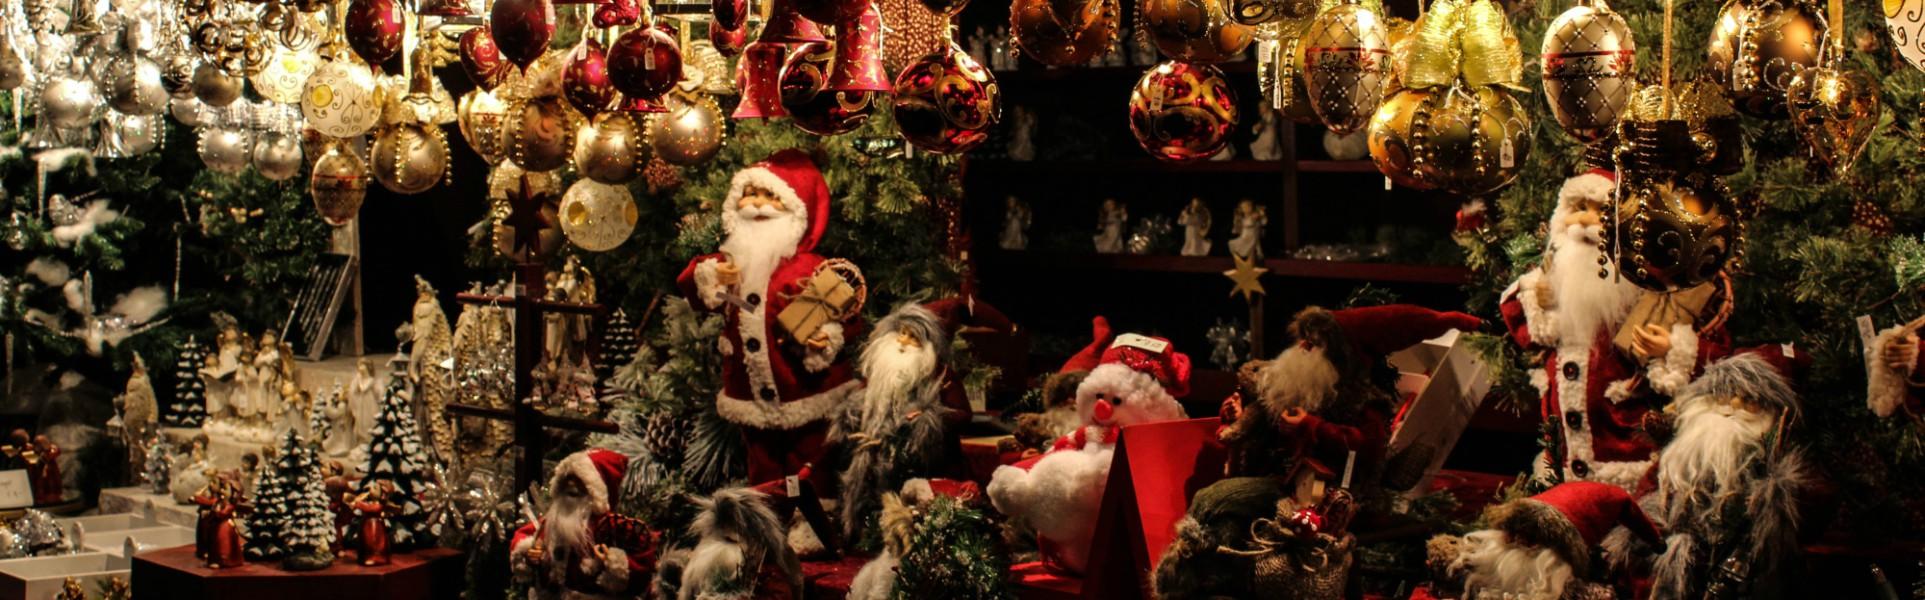 christmas-market-540918-1